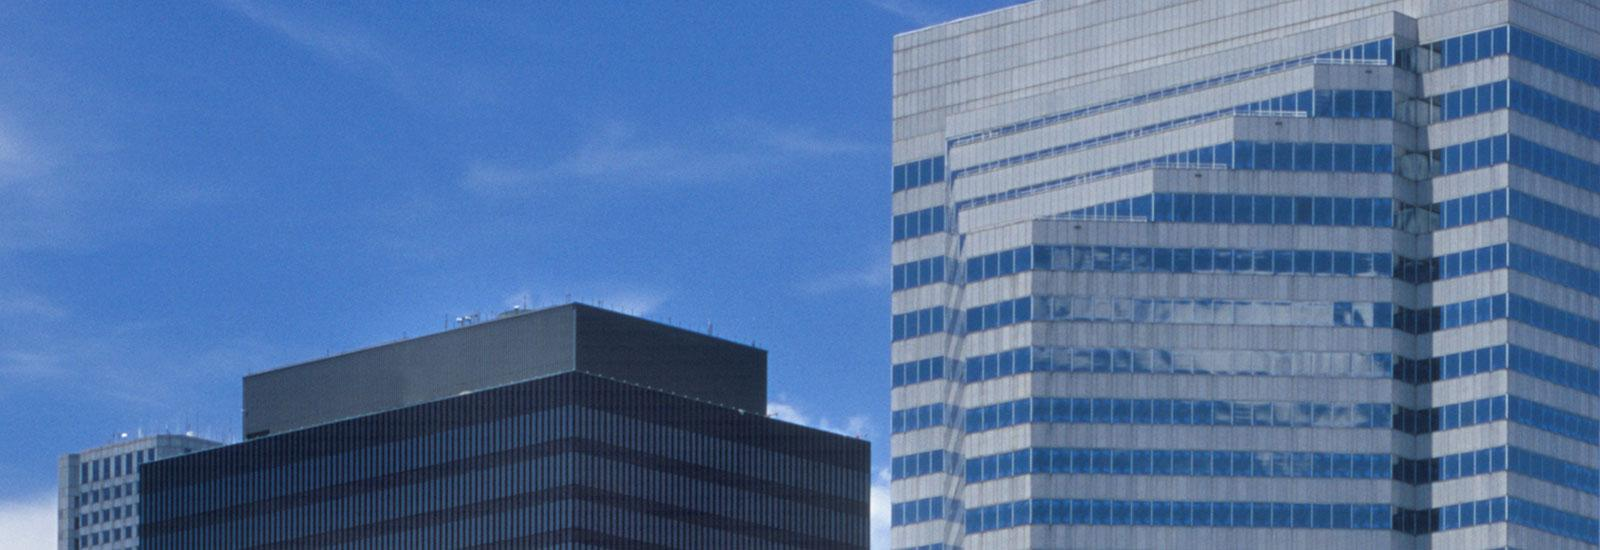 marketsector-tall-buildings